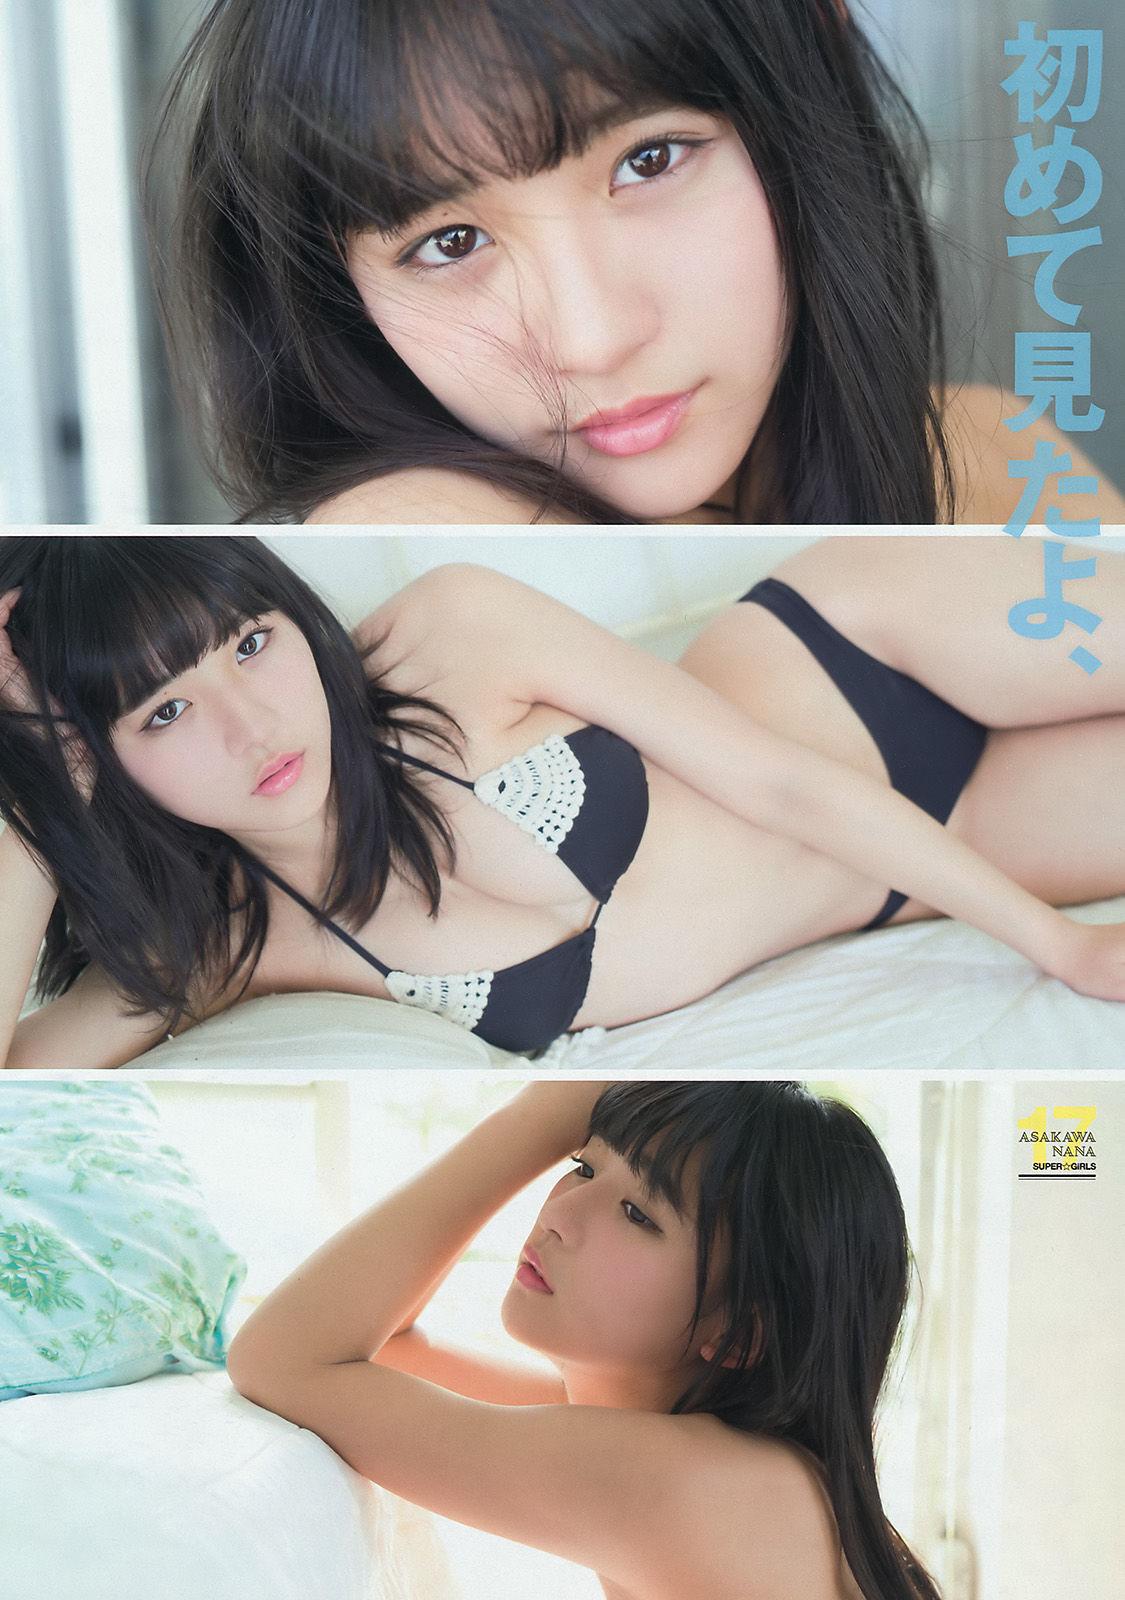 VOL.192 [Young Magazine]杂志:浅川梨奈超高清写真套图(13P)